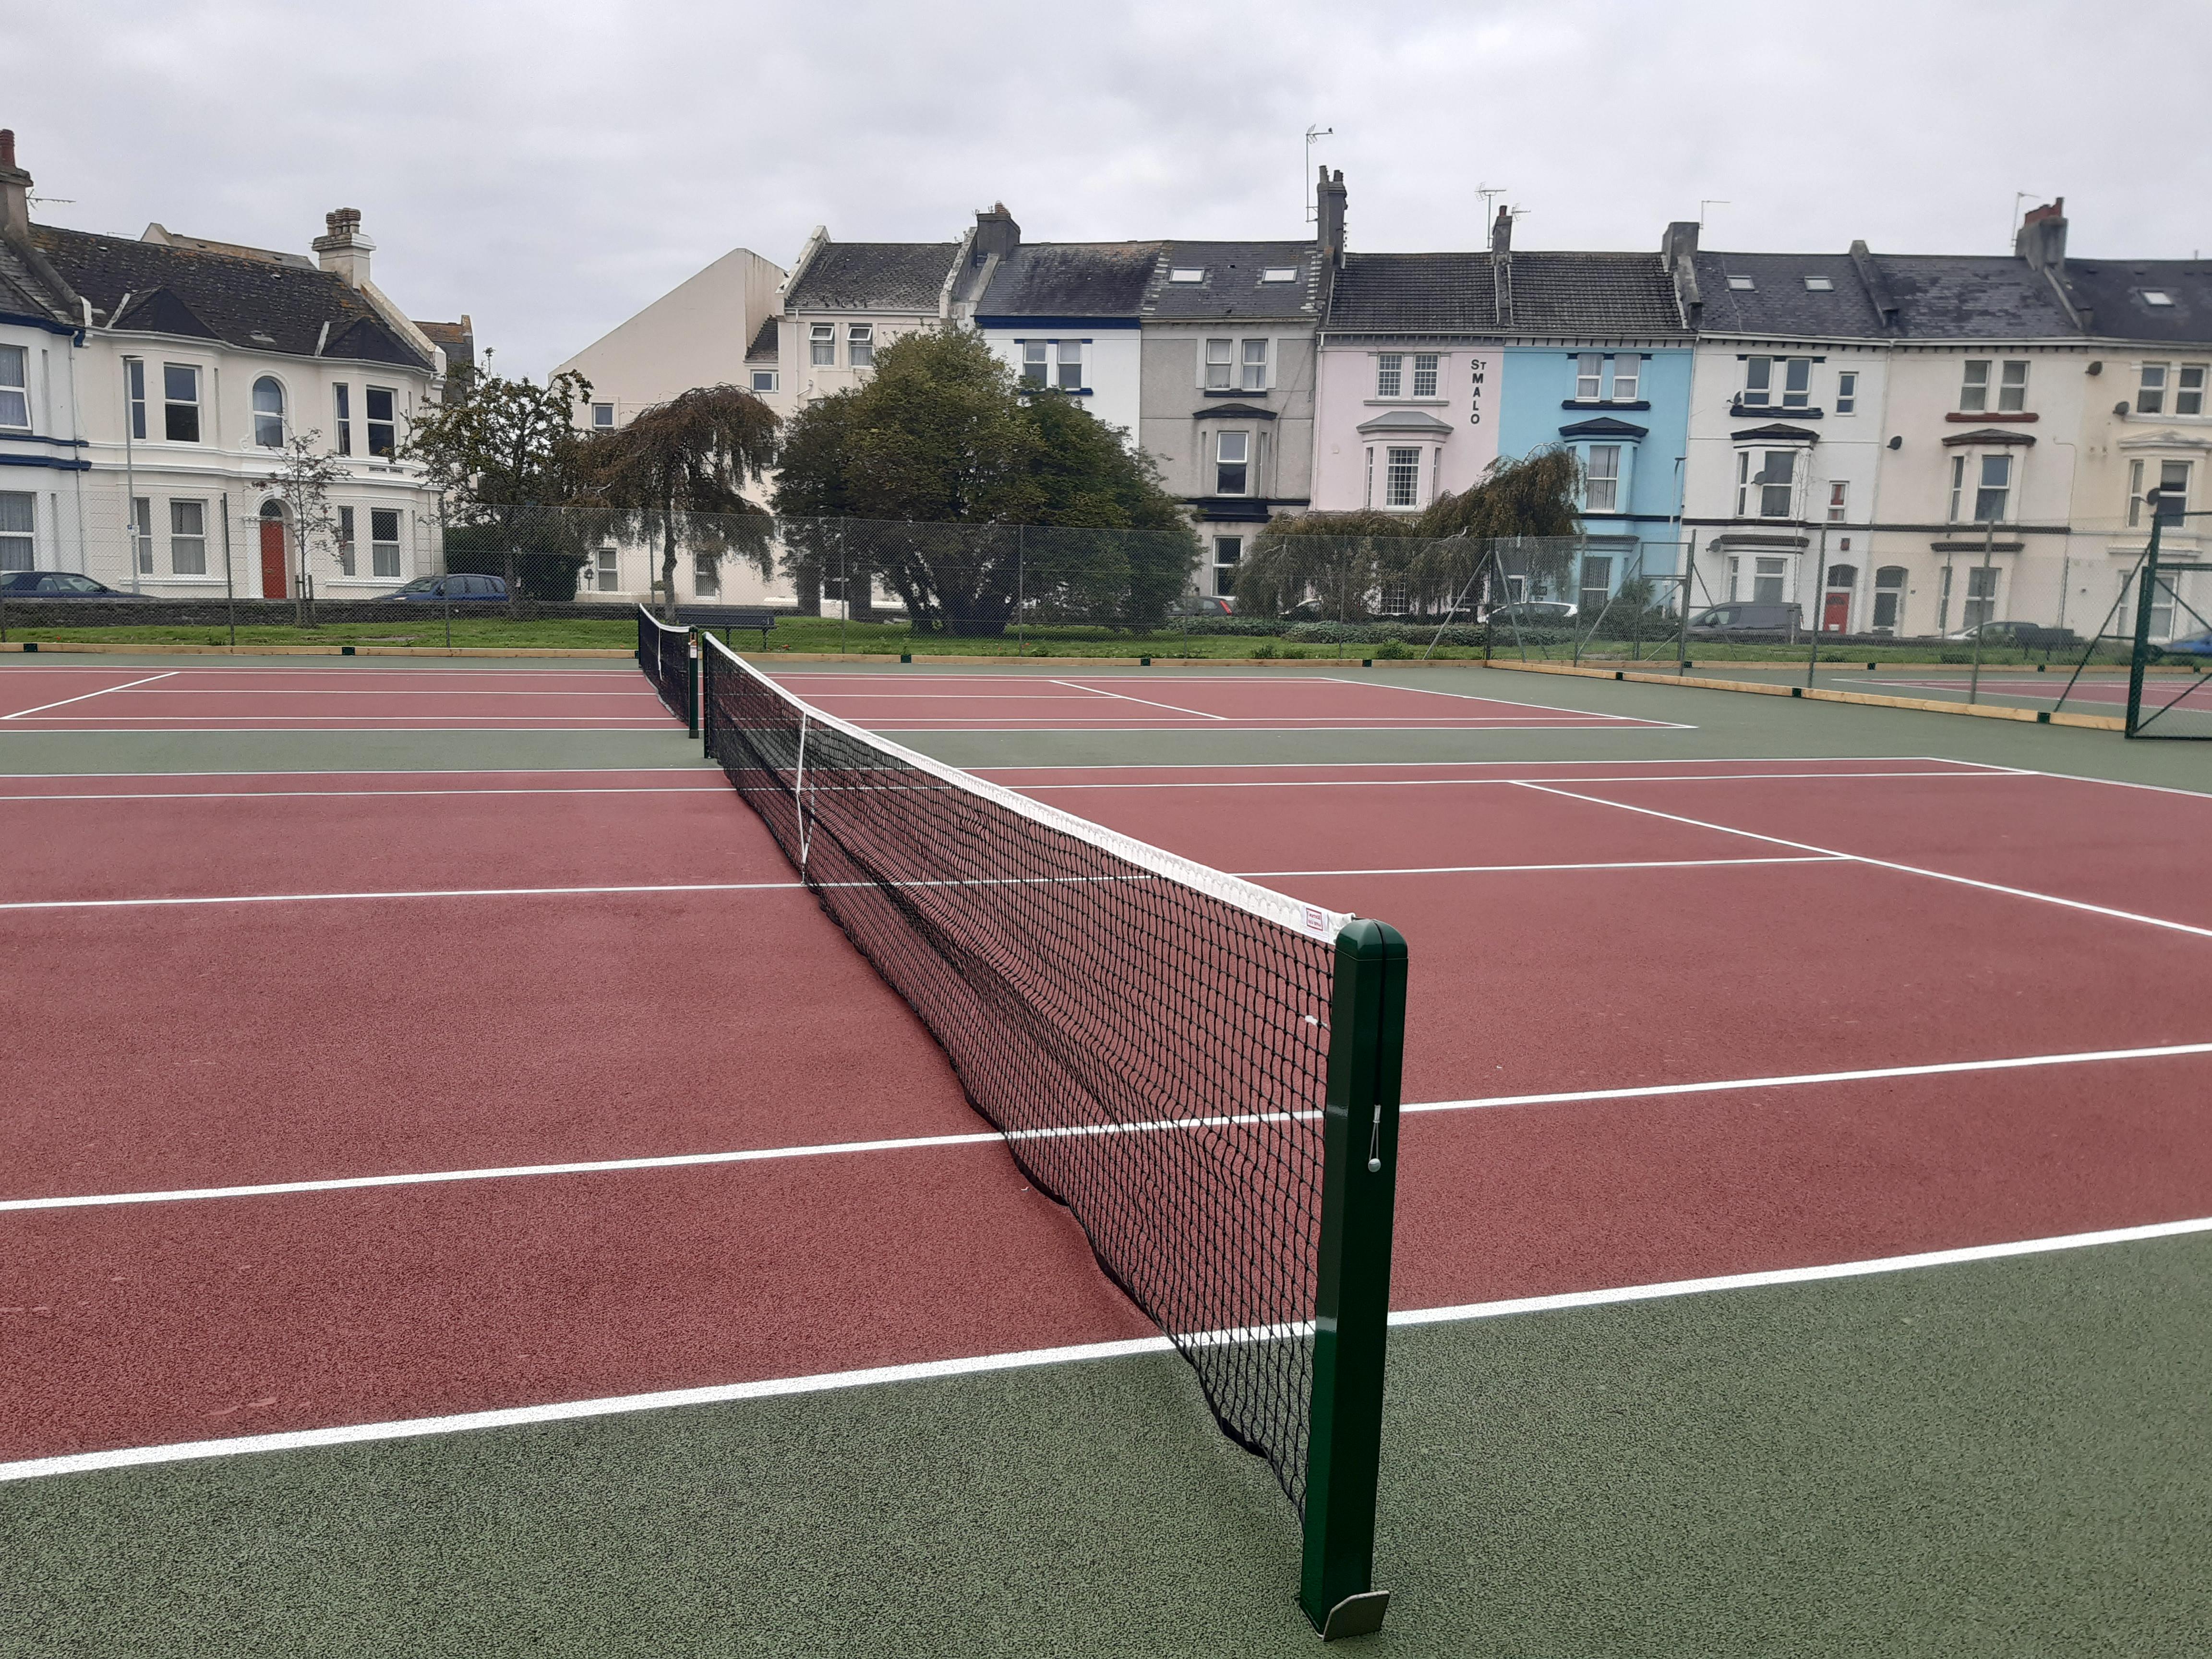 West Hoe Tennis Courts